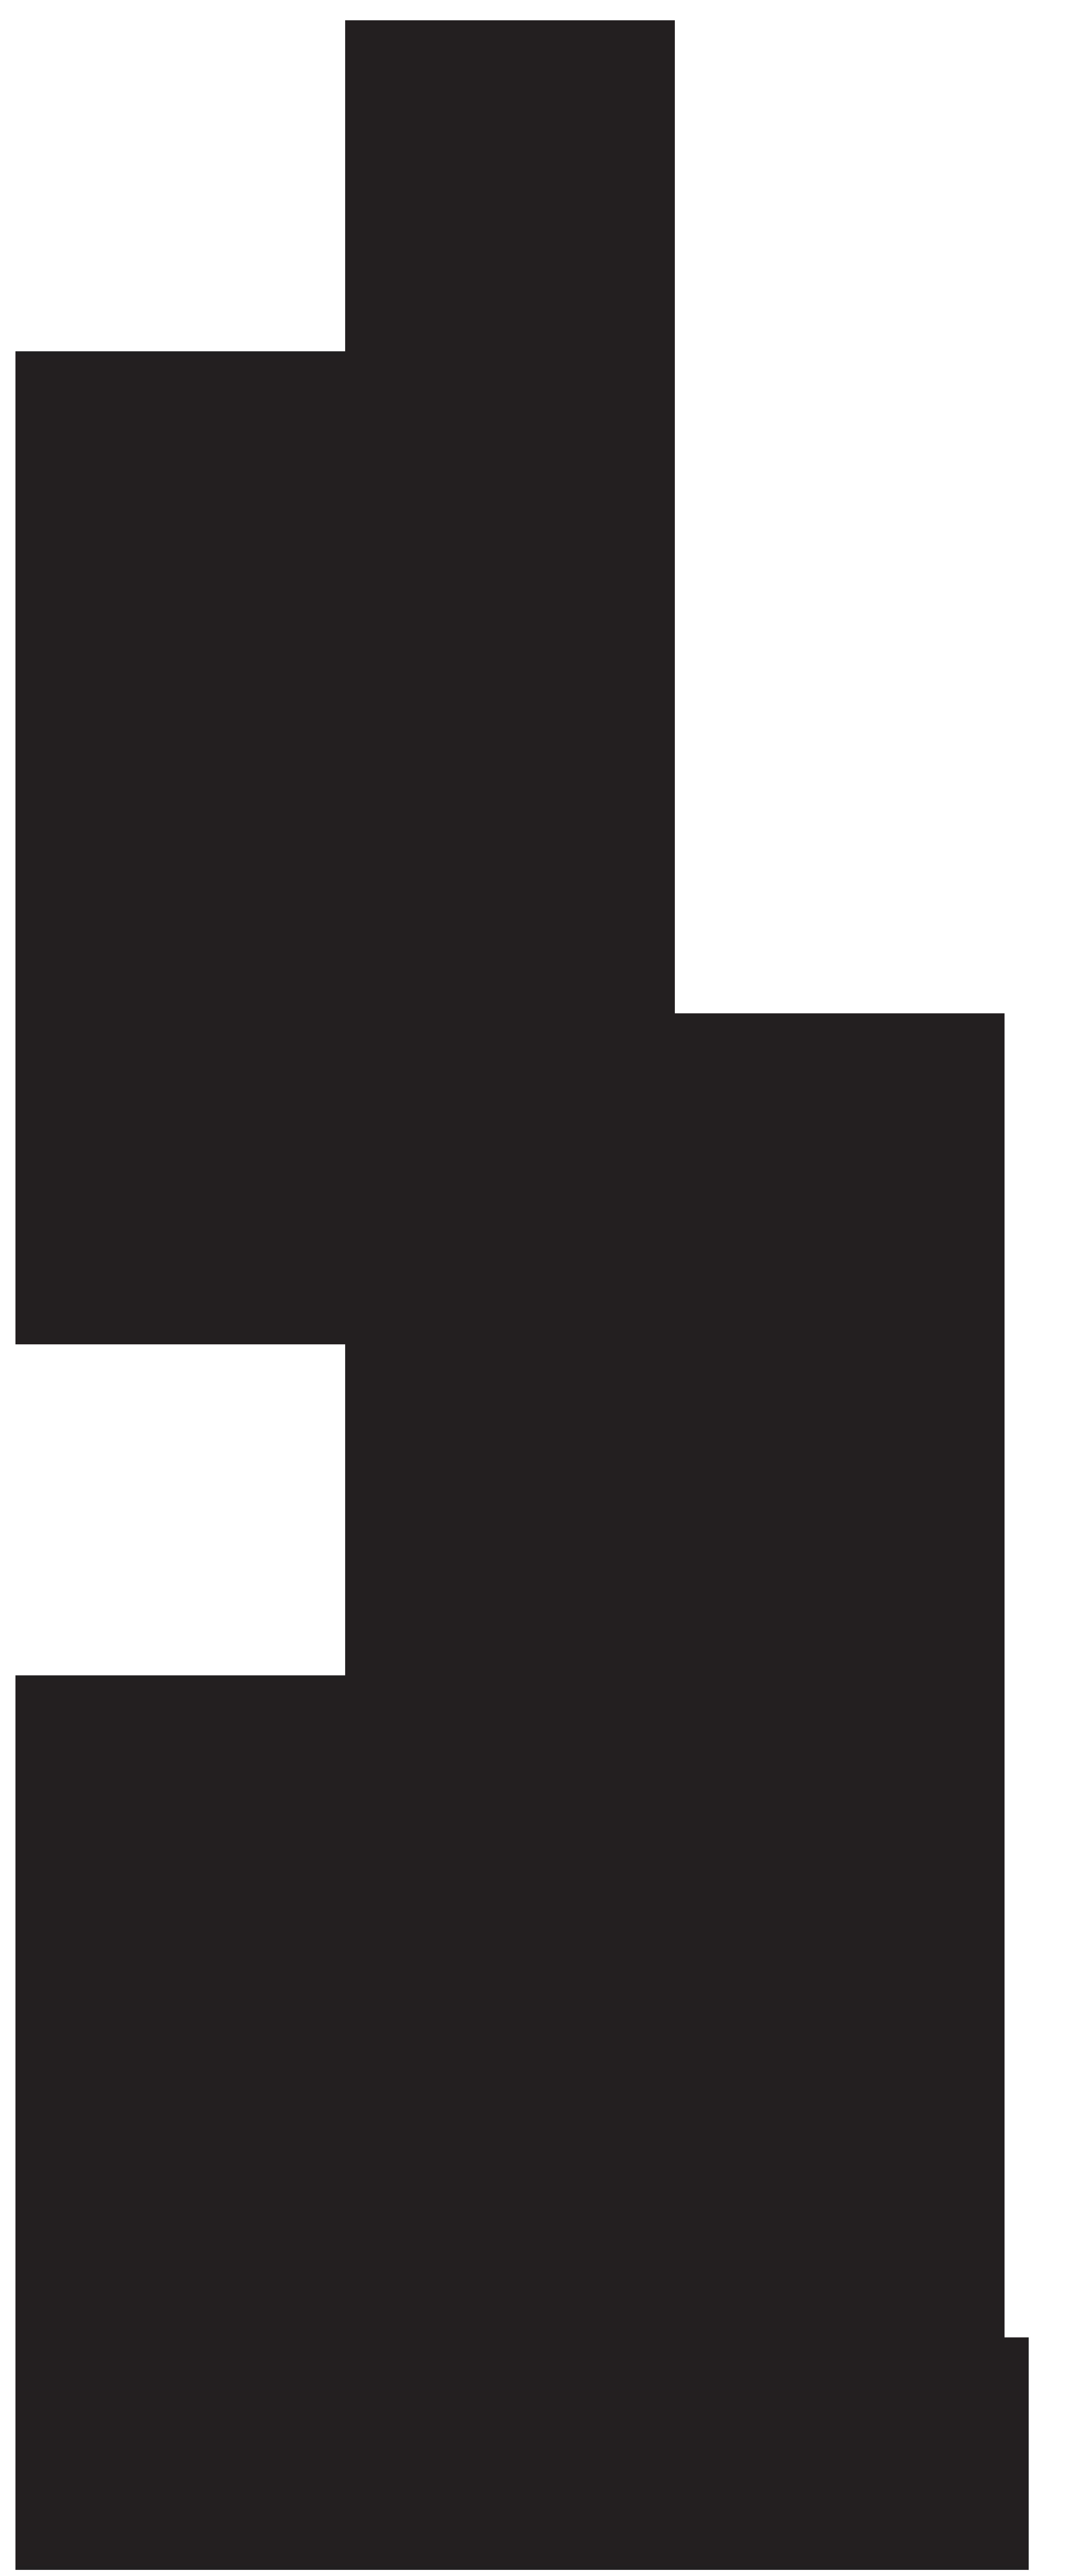 Dancing man silhouette png. Dancer clipart high kick